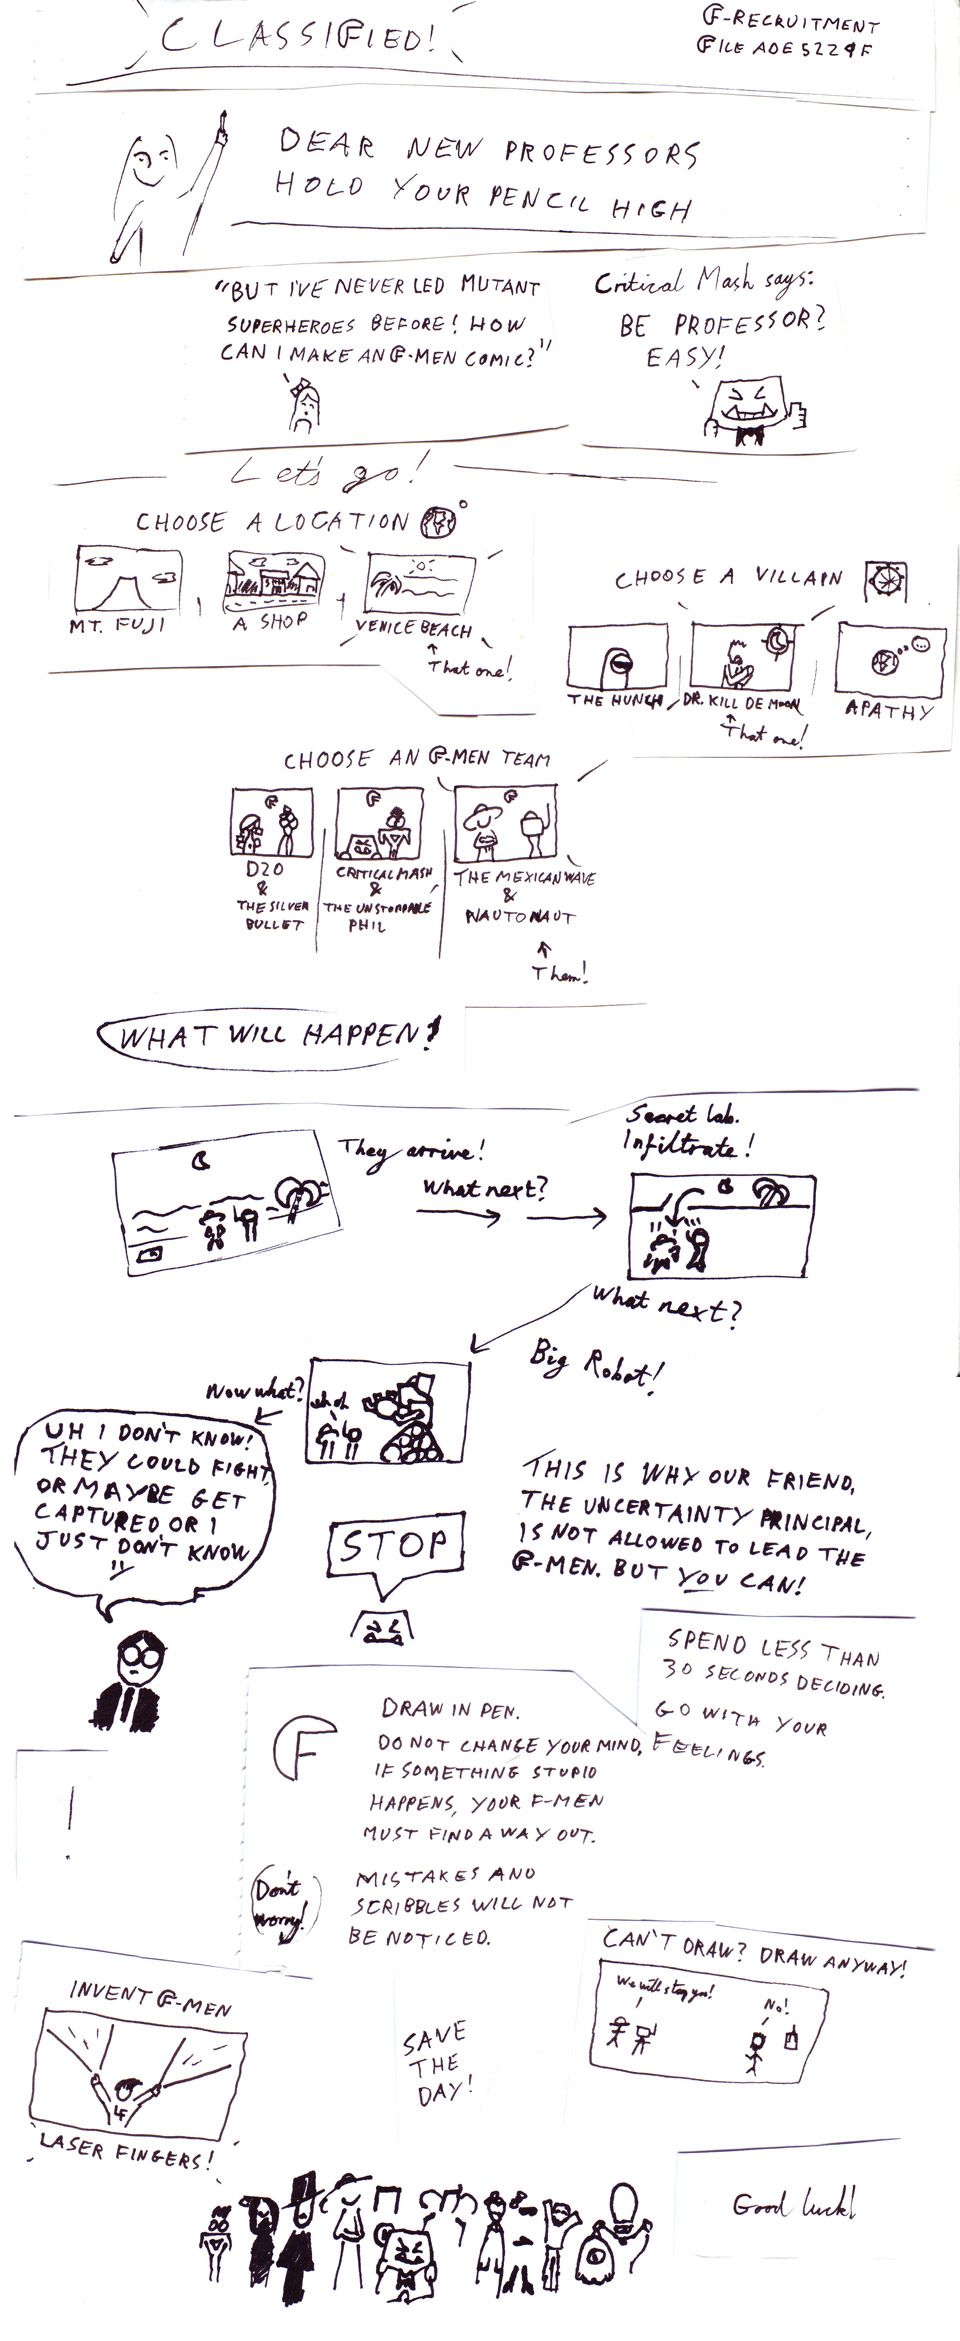 How to Make an F-Men Comic by Pachunka